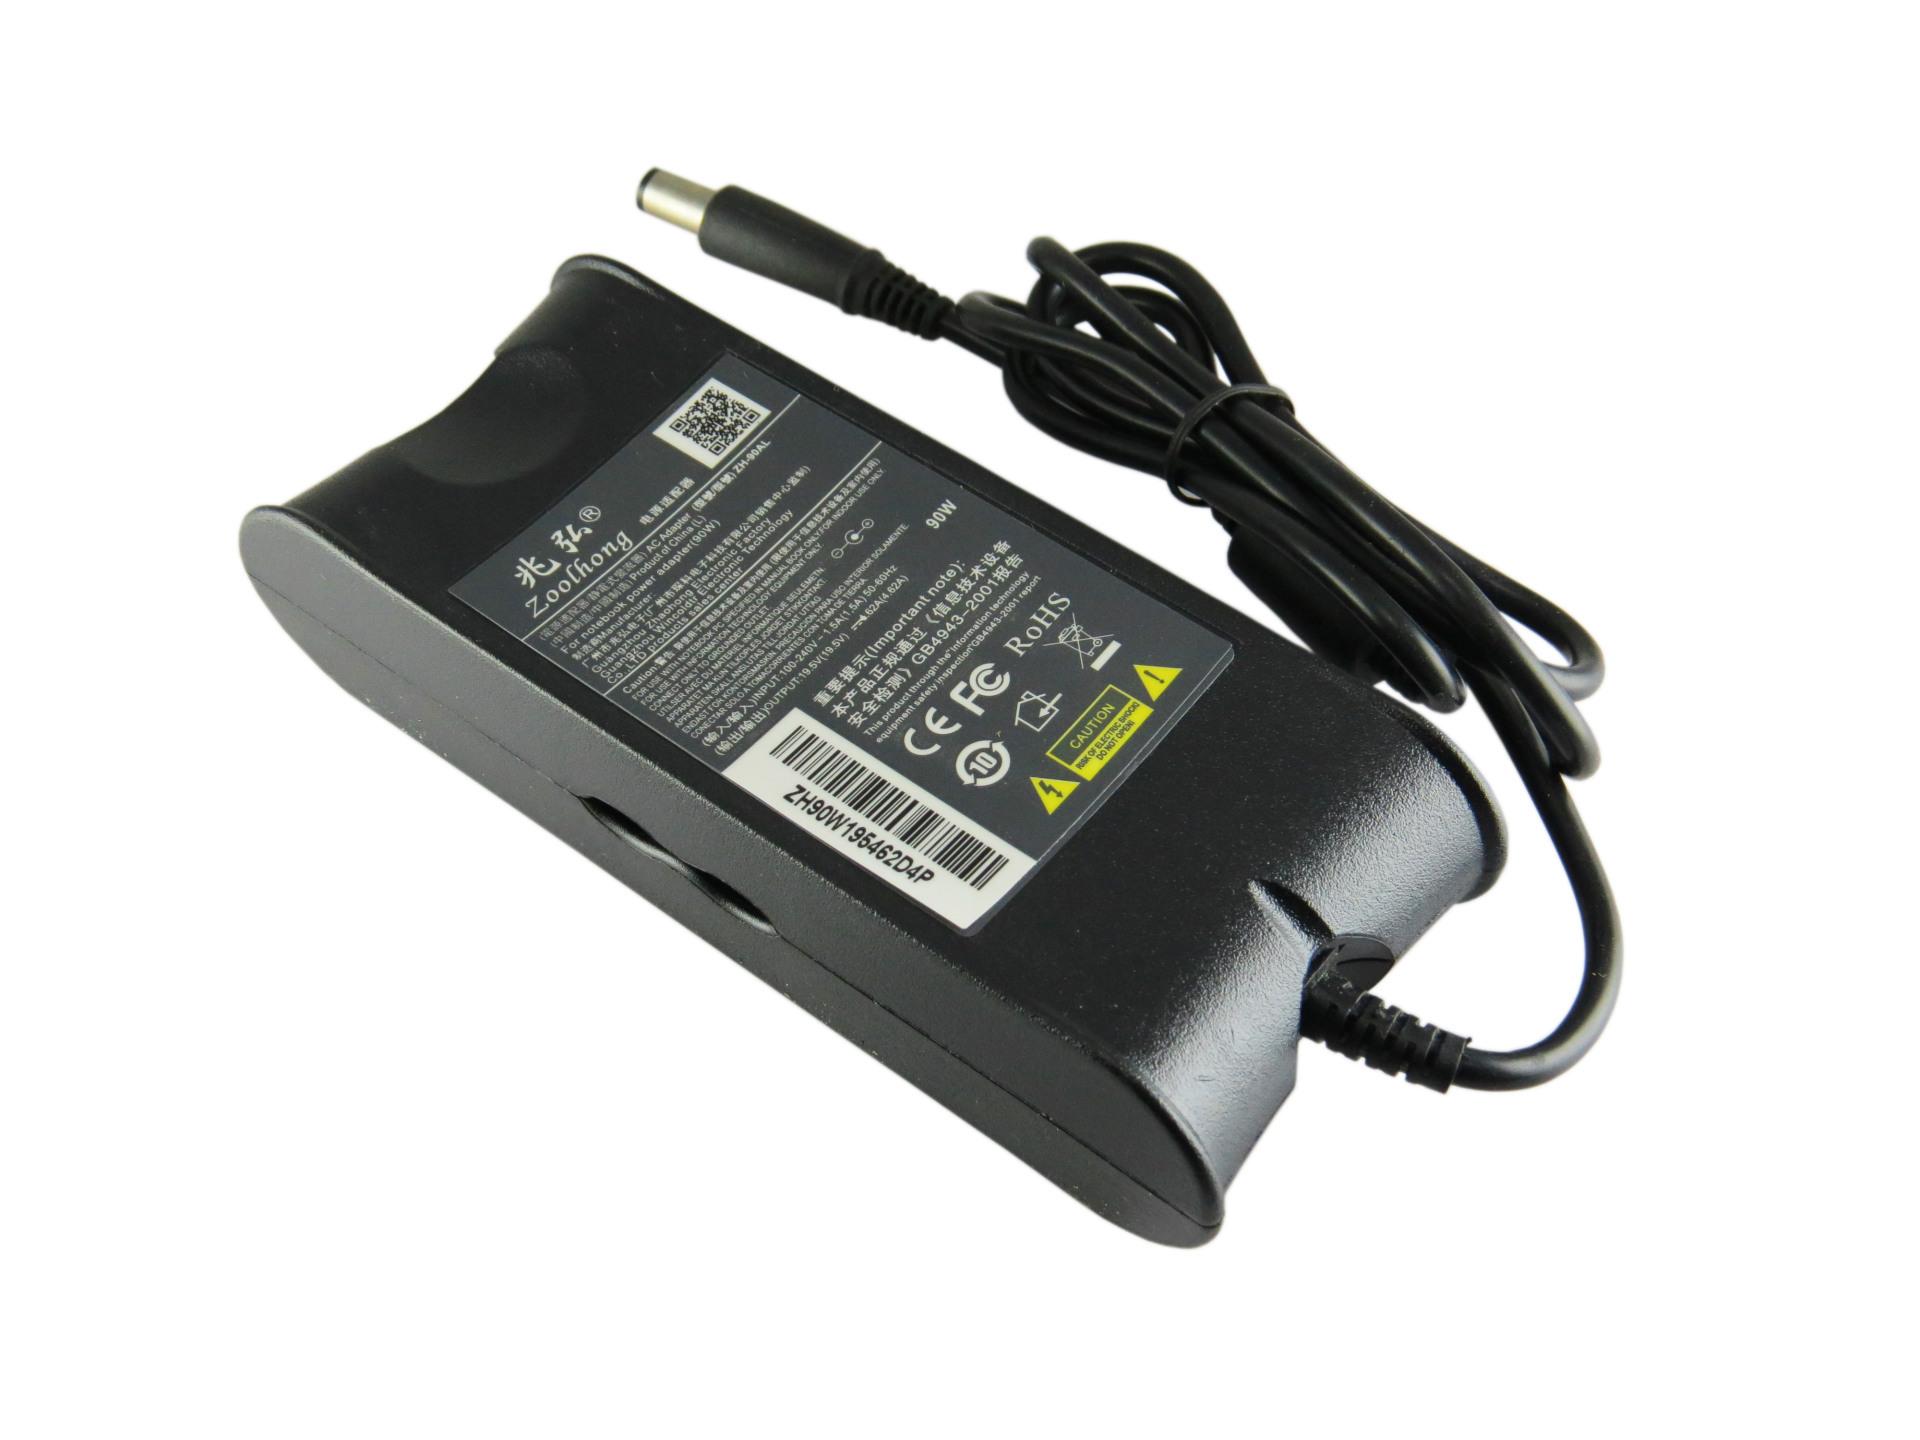 19.5 V 4.62 A 90W מחשב נייד מתאם מתח ה AC מטען של DELL, AD-90195D PA-1900-01D3 DF266 M20 M60 M65 M70 1410 1420 7.4 מ